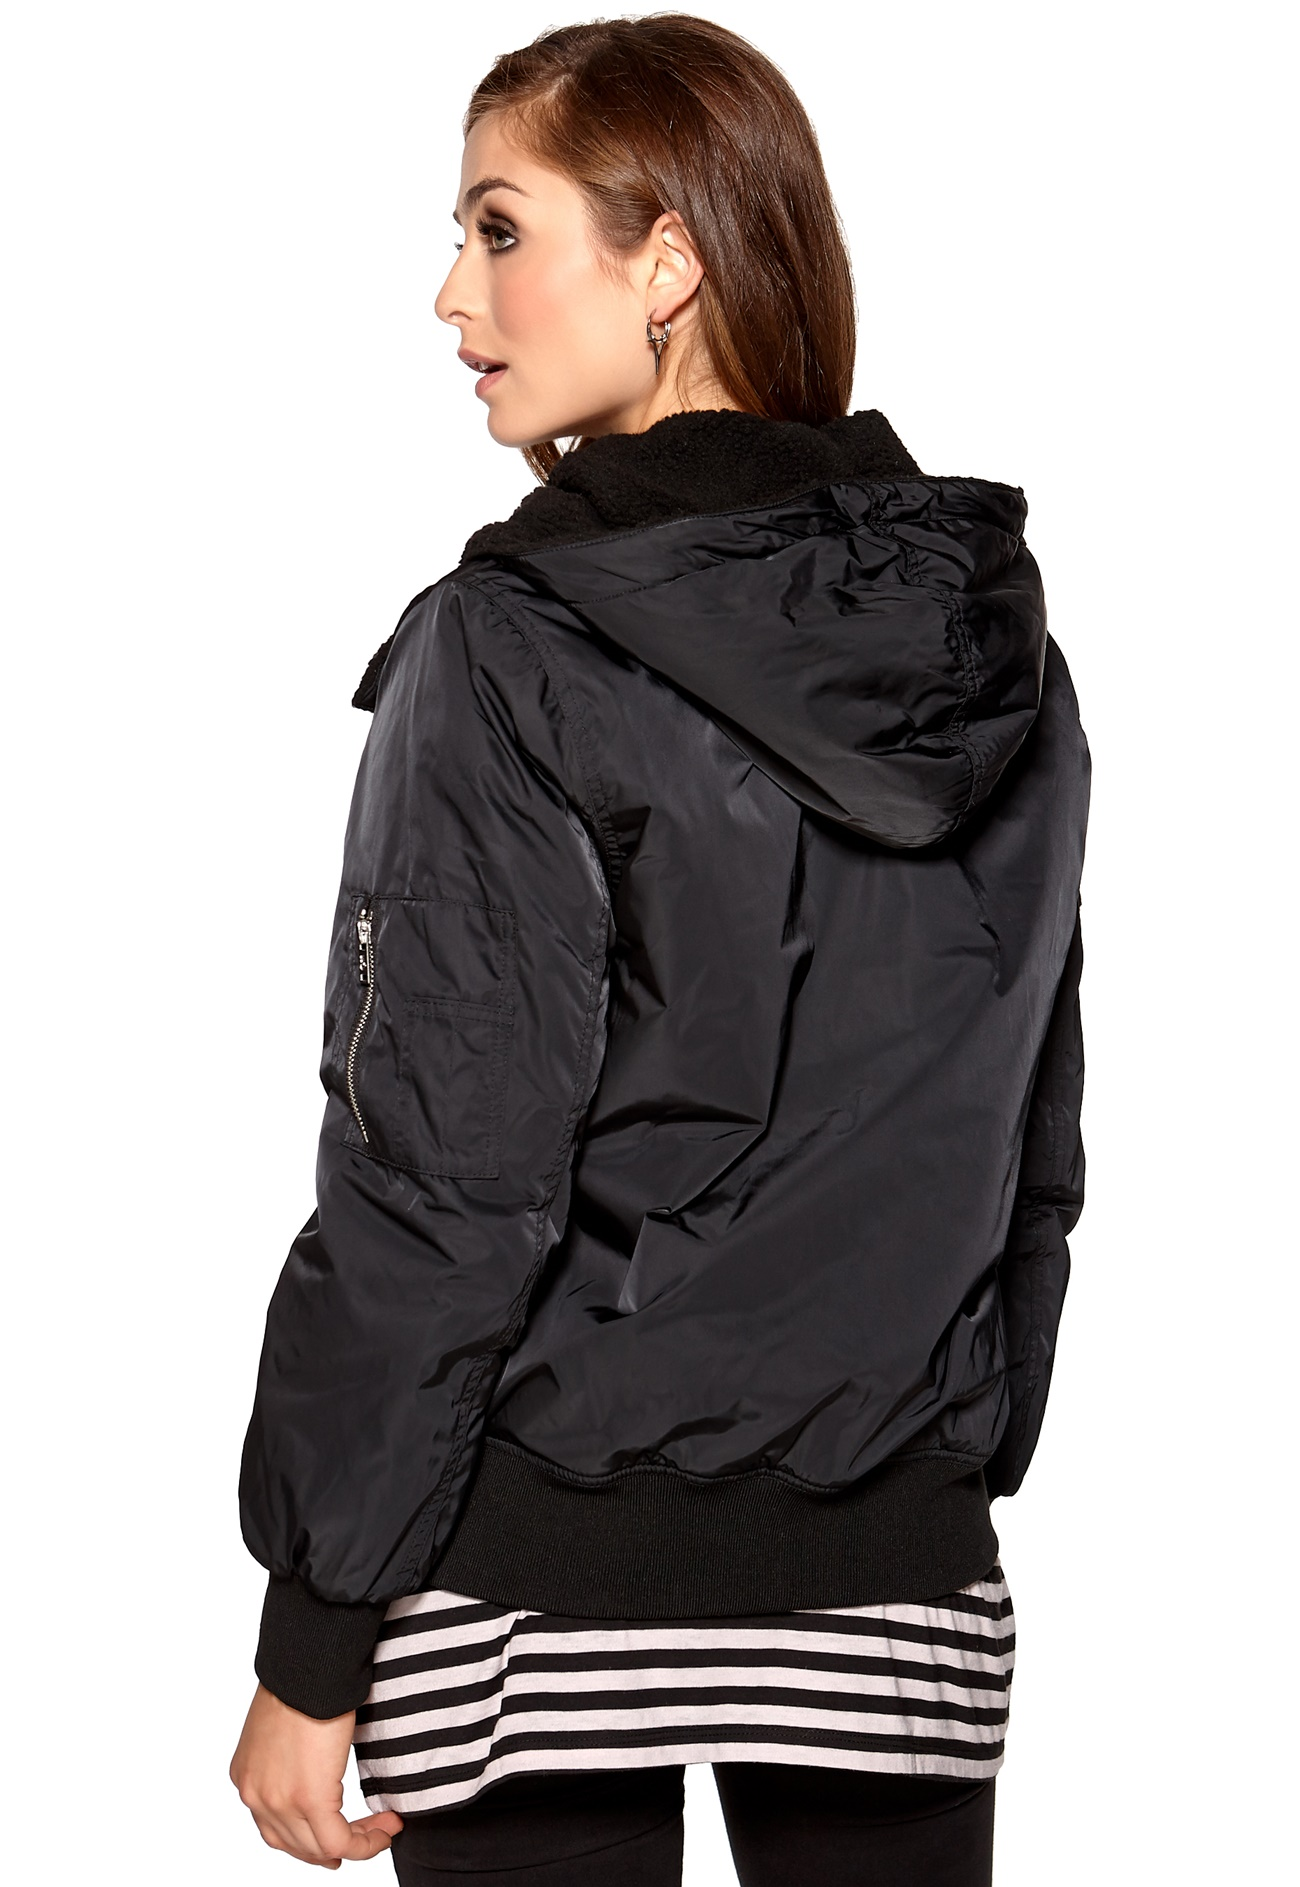 Women's Bomber Jacket - Deep Ruby / Side Slit Pockets / Zip front